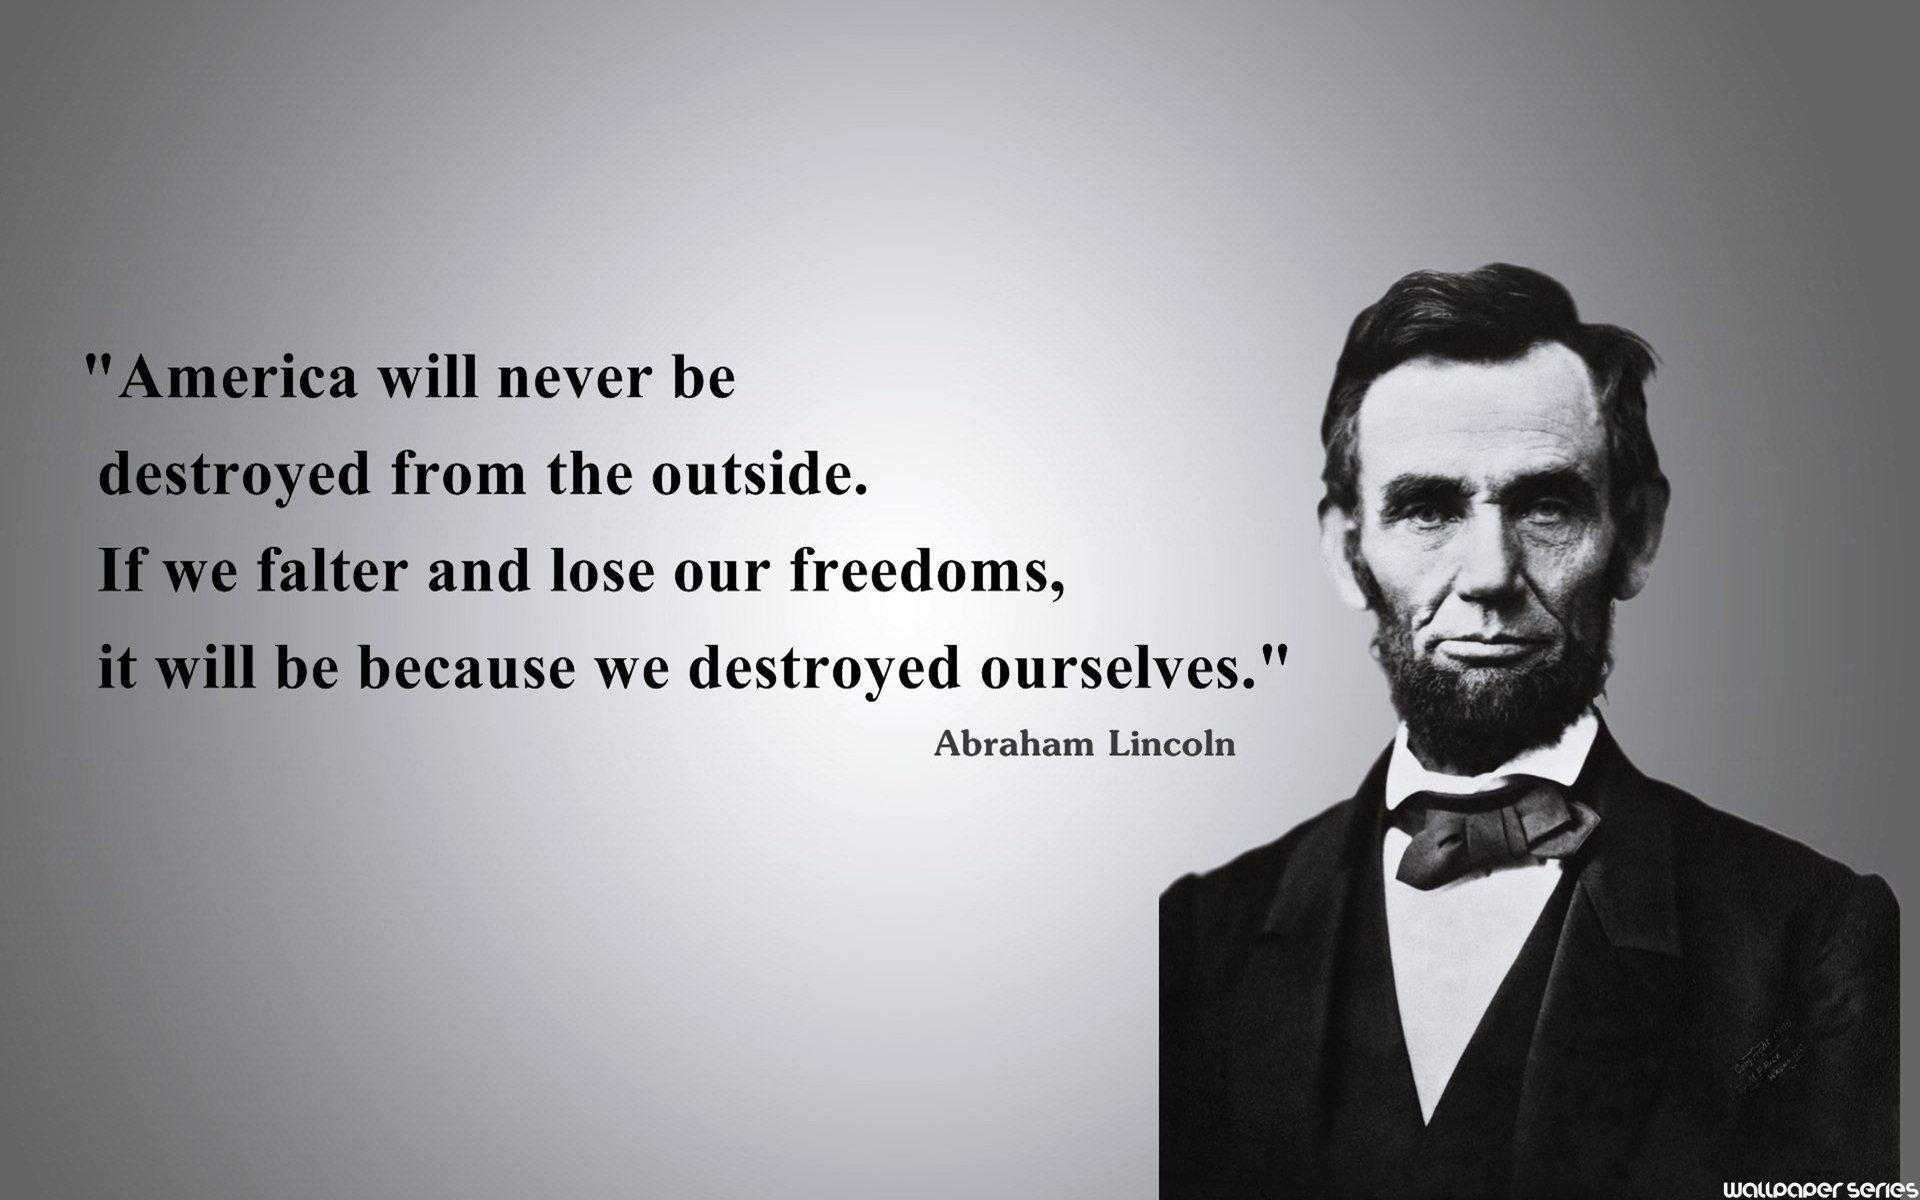 Abraham Lincoln wallpaper 1920x1200 61340 1920x1200